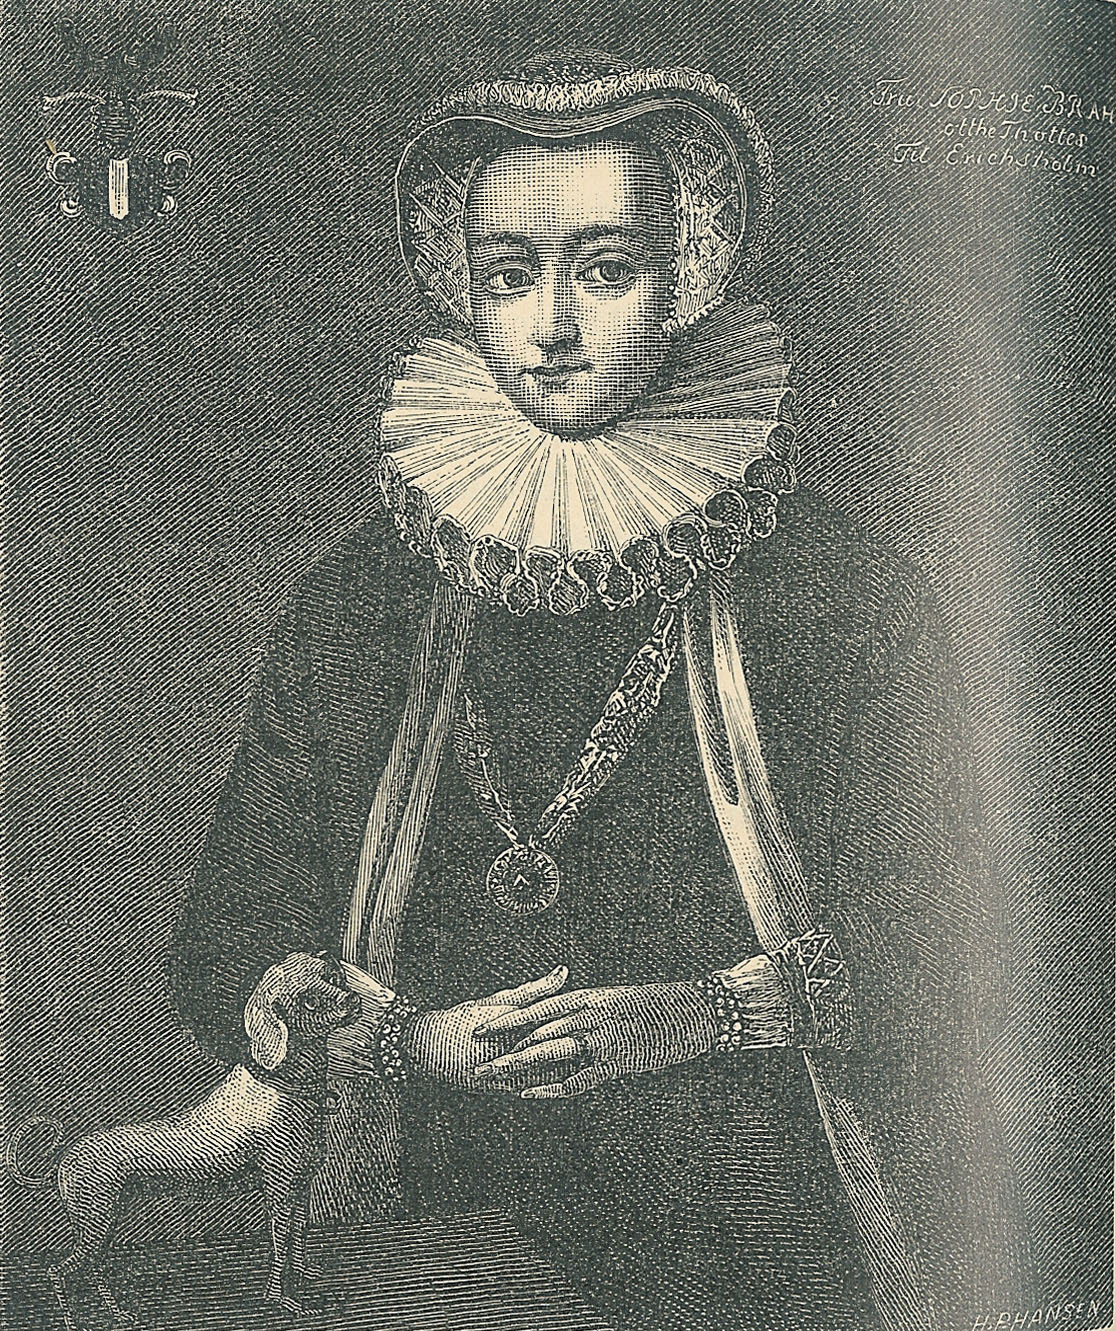 Sophie Brahe (1556 - 1643), astronome danoise - P. Hansens